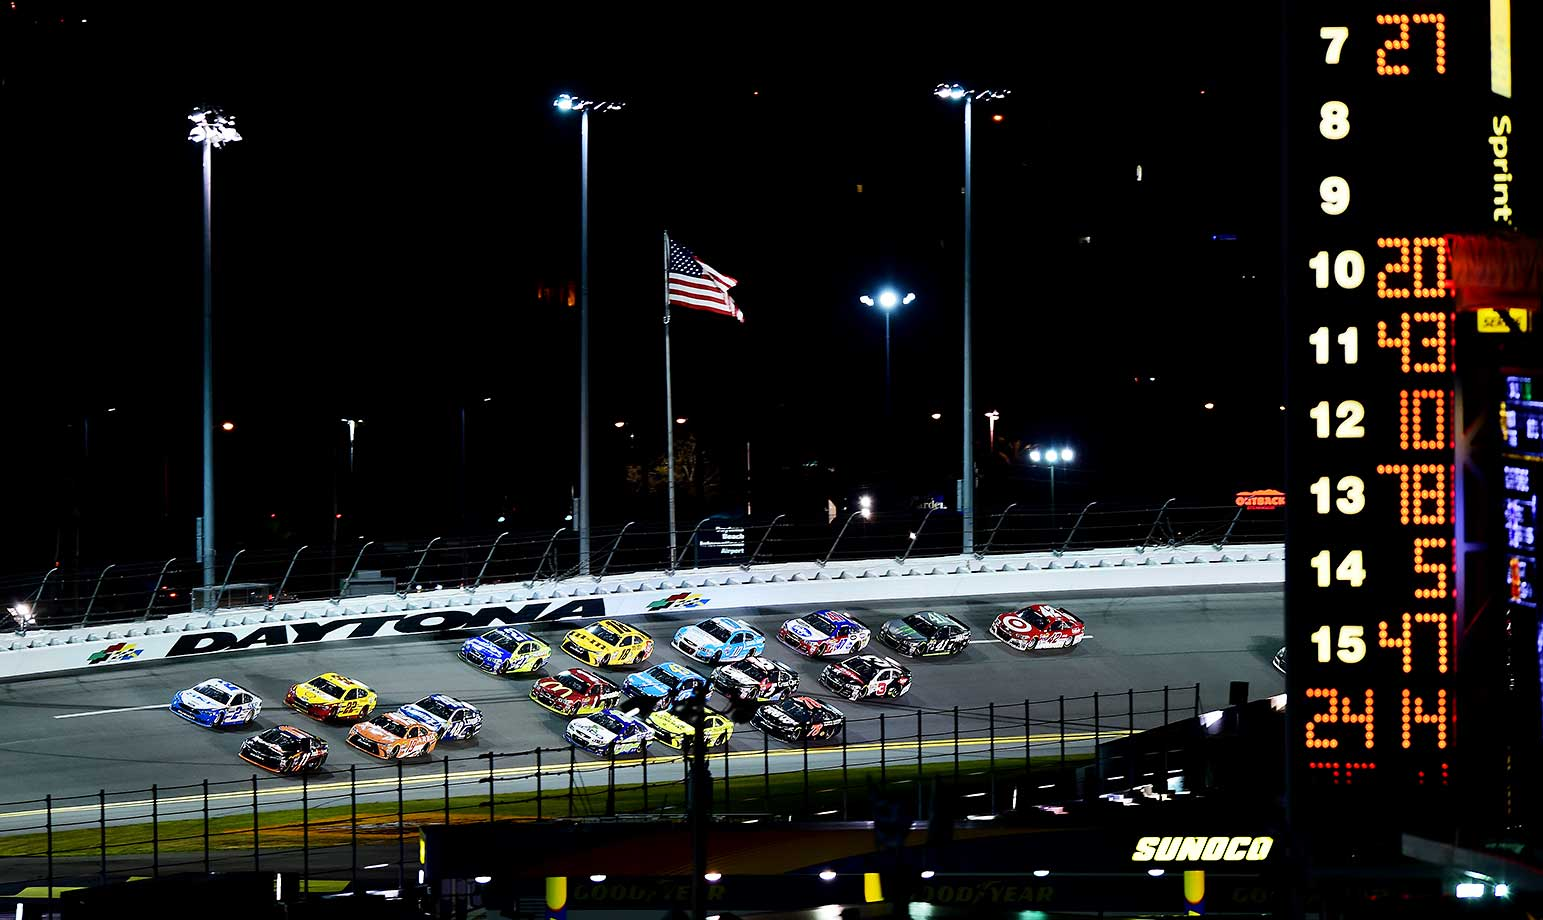 DBrad Keselowski and Denny Hamlin lead a pack of cars during the NASCAR Sprint Cup Series Sprint Unlimited at Daytona.